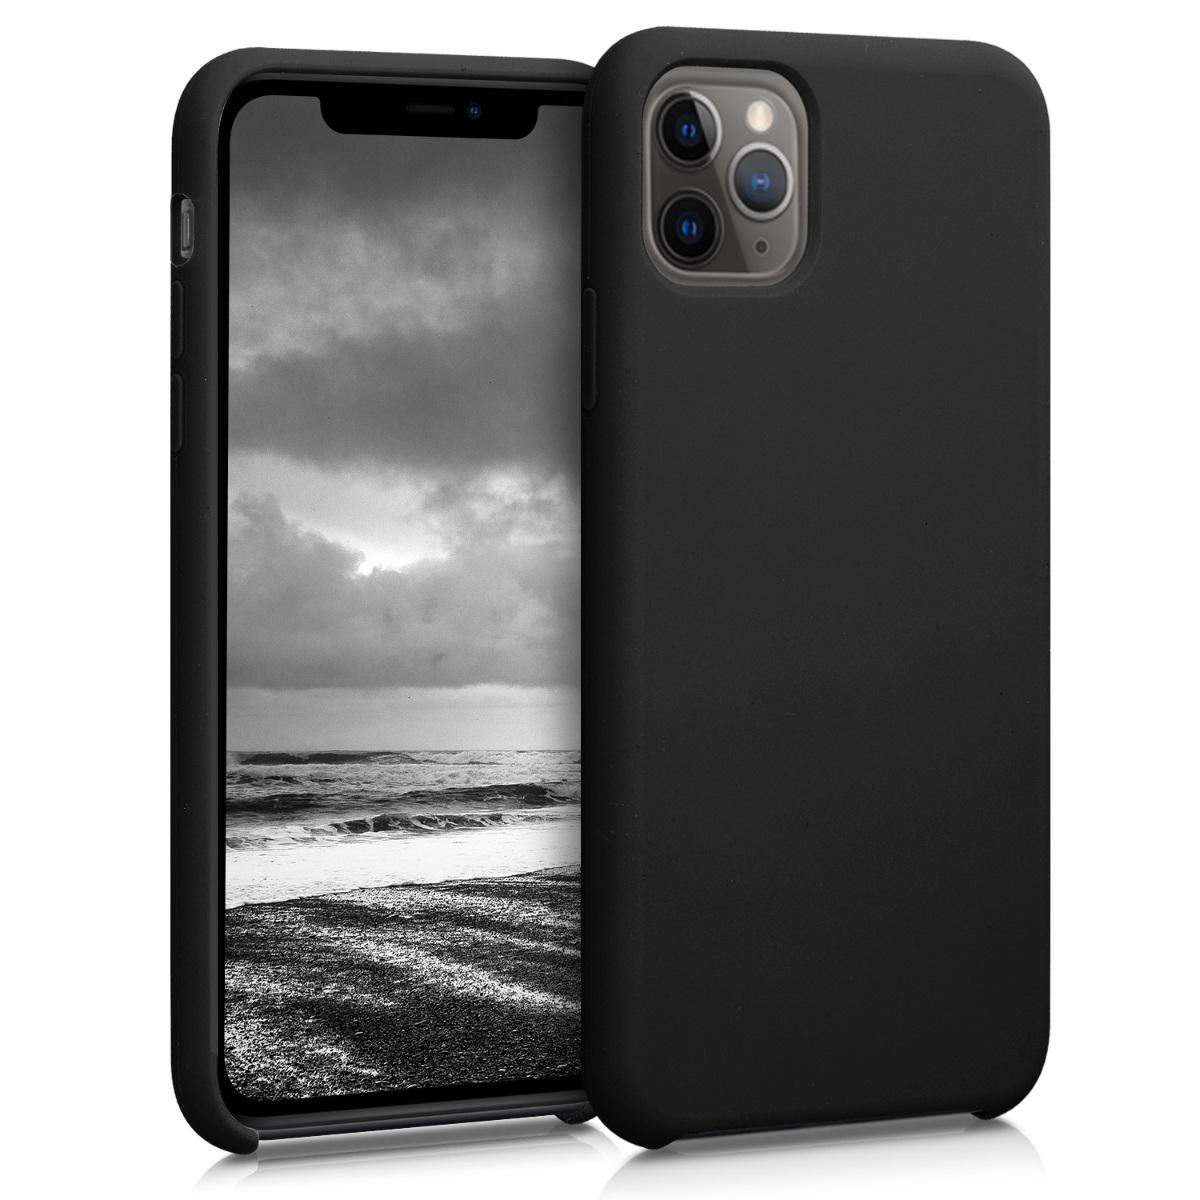 KW Θήκη Σιλικόνης Apple iPhone 11 Pro Max - Soft Flexible Rubber - Black (49725.01)